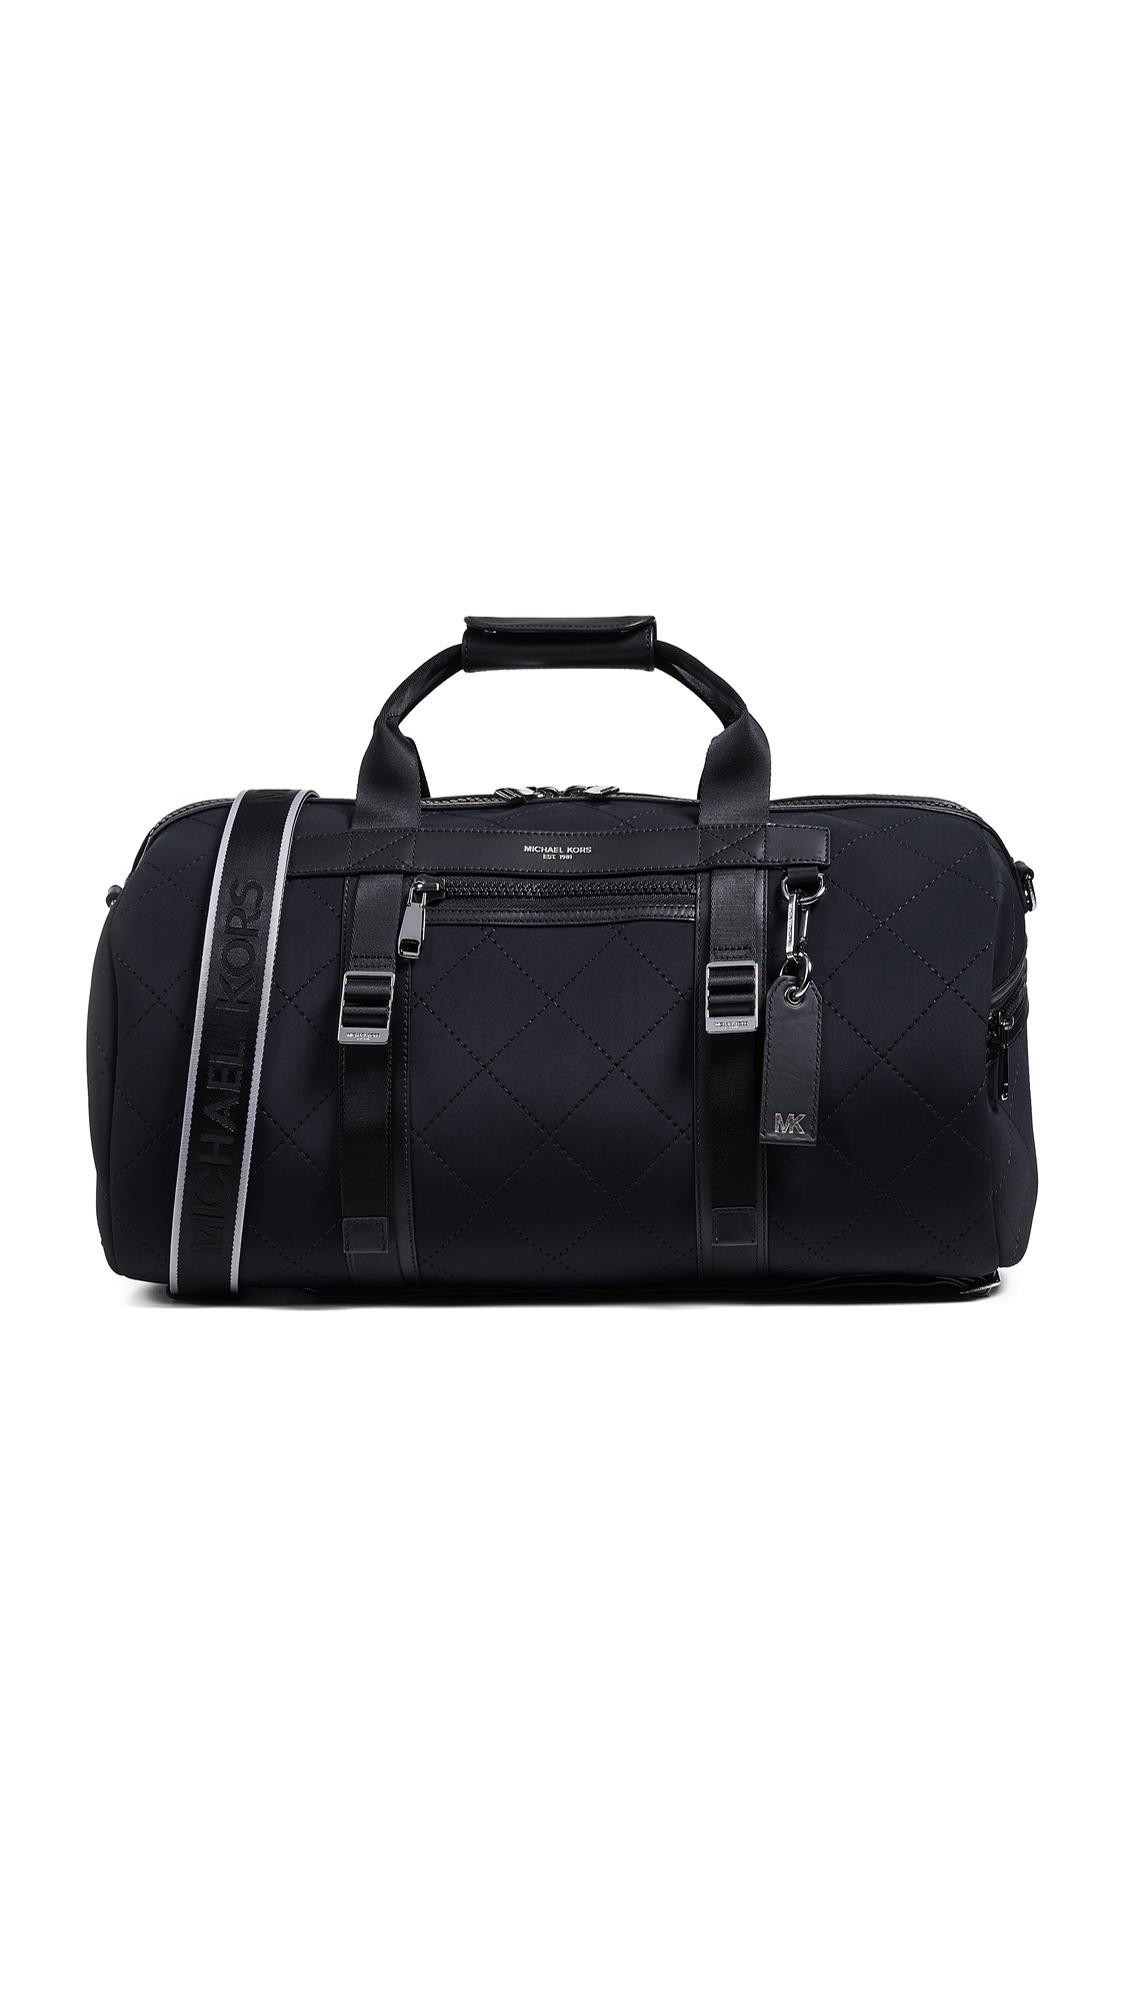 e82f12587042 Michael Kors Odin Neoprene Convertible Duffel Backpack In Black ...